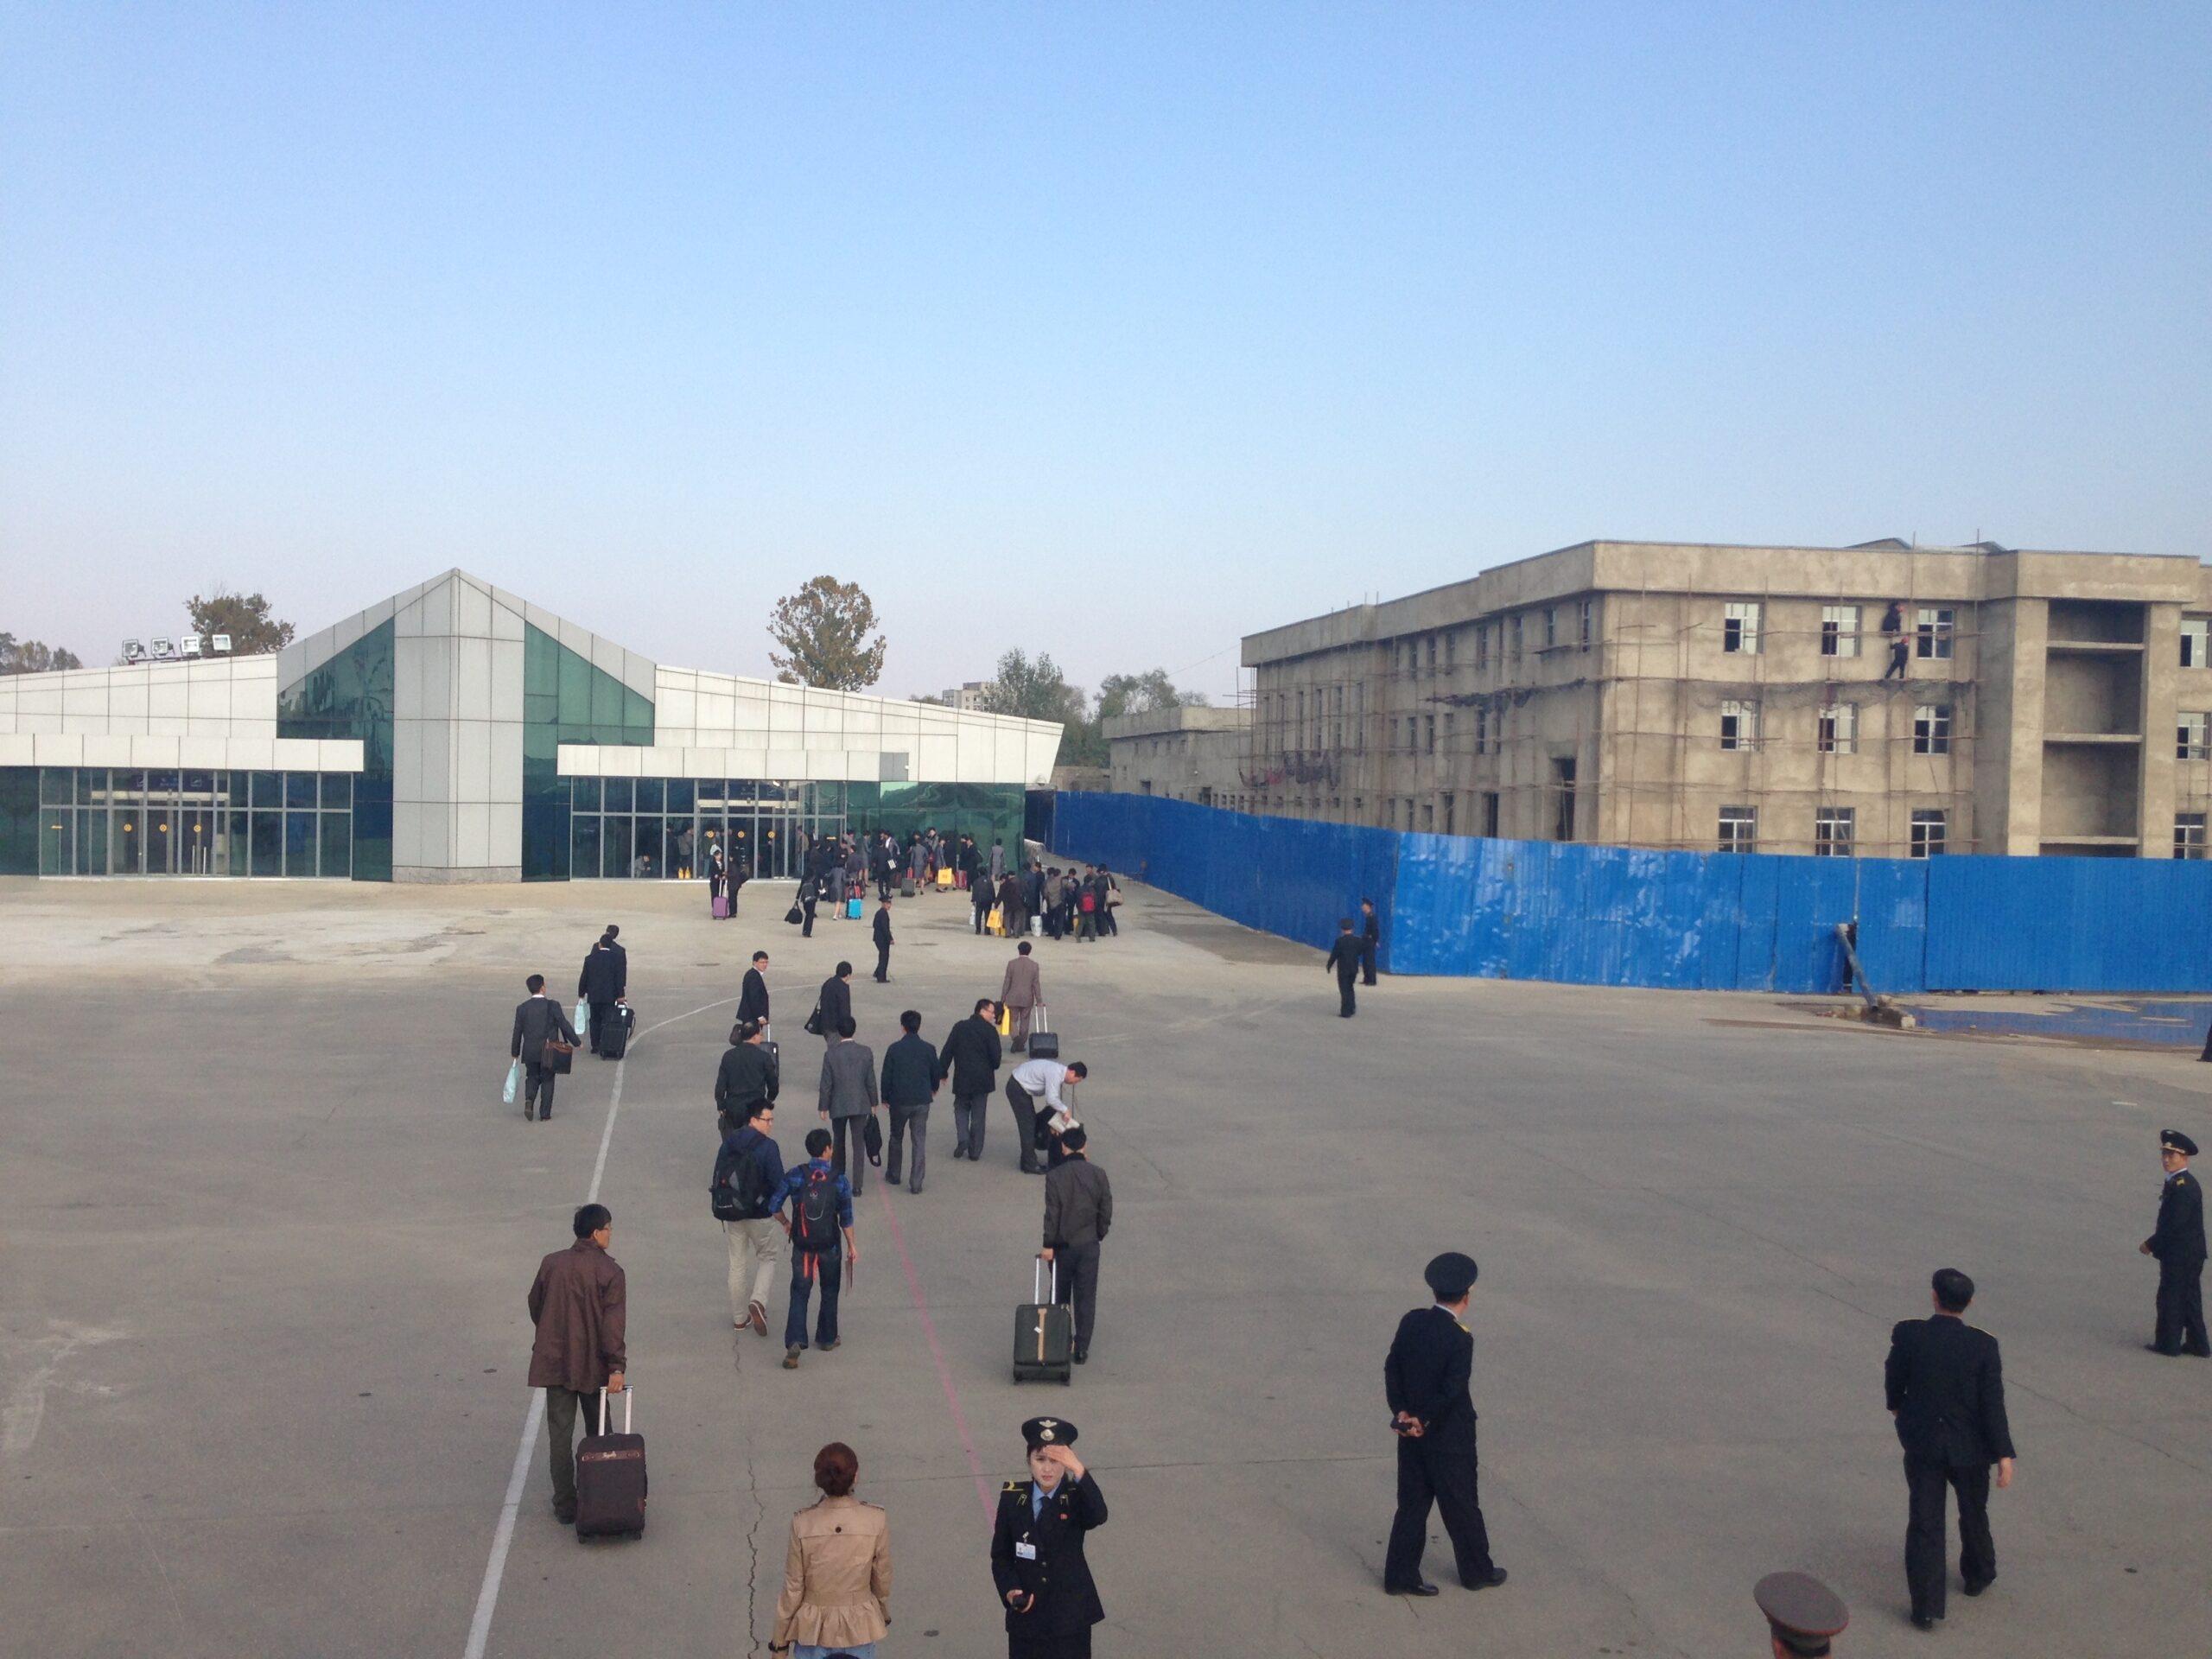 The view upon landing at Pyongyang (2013)